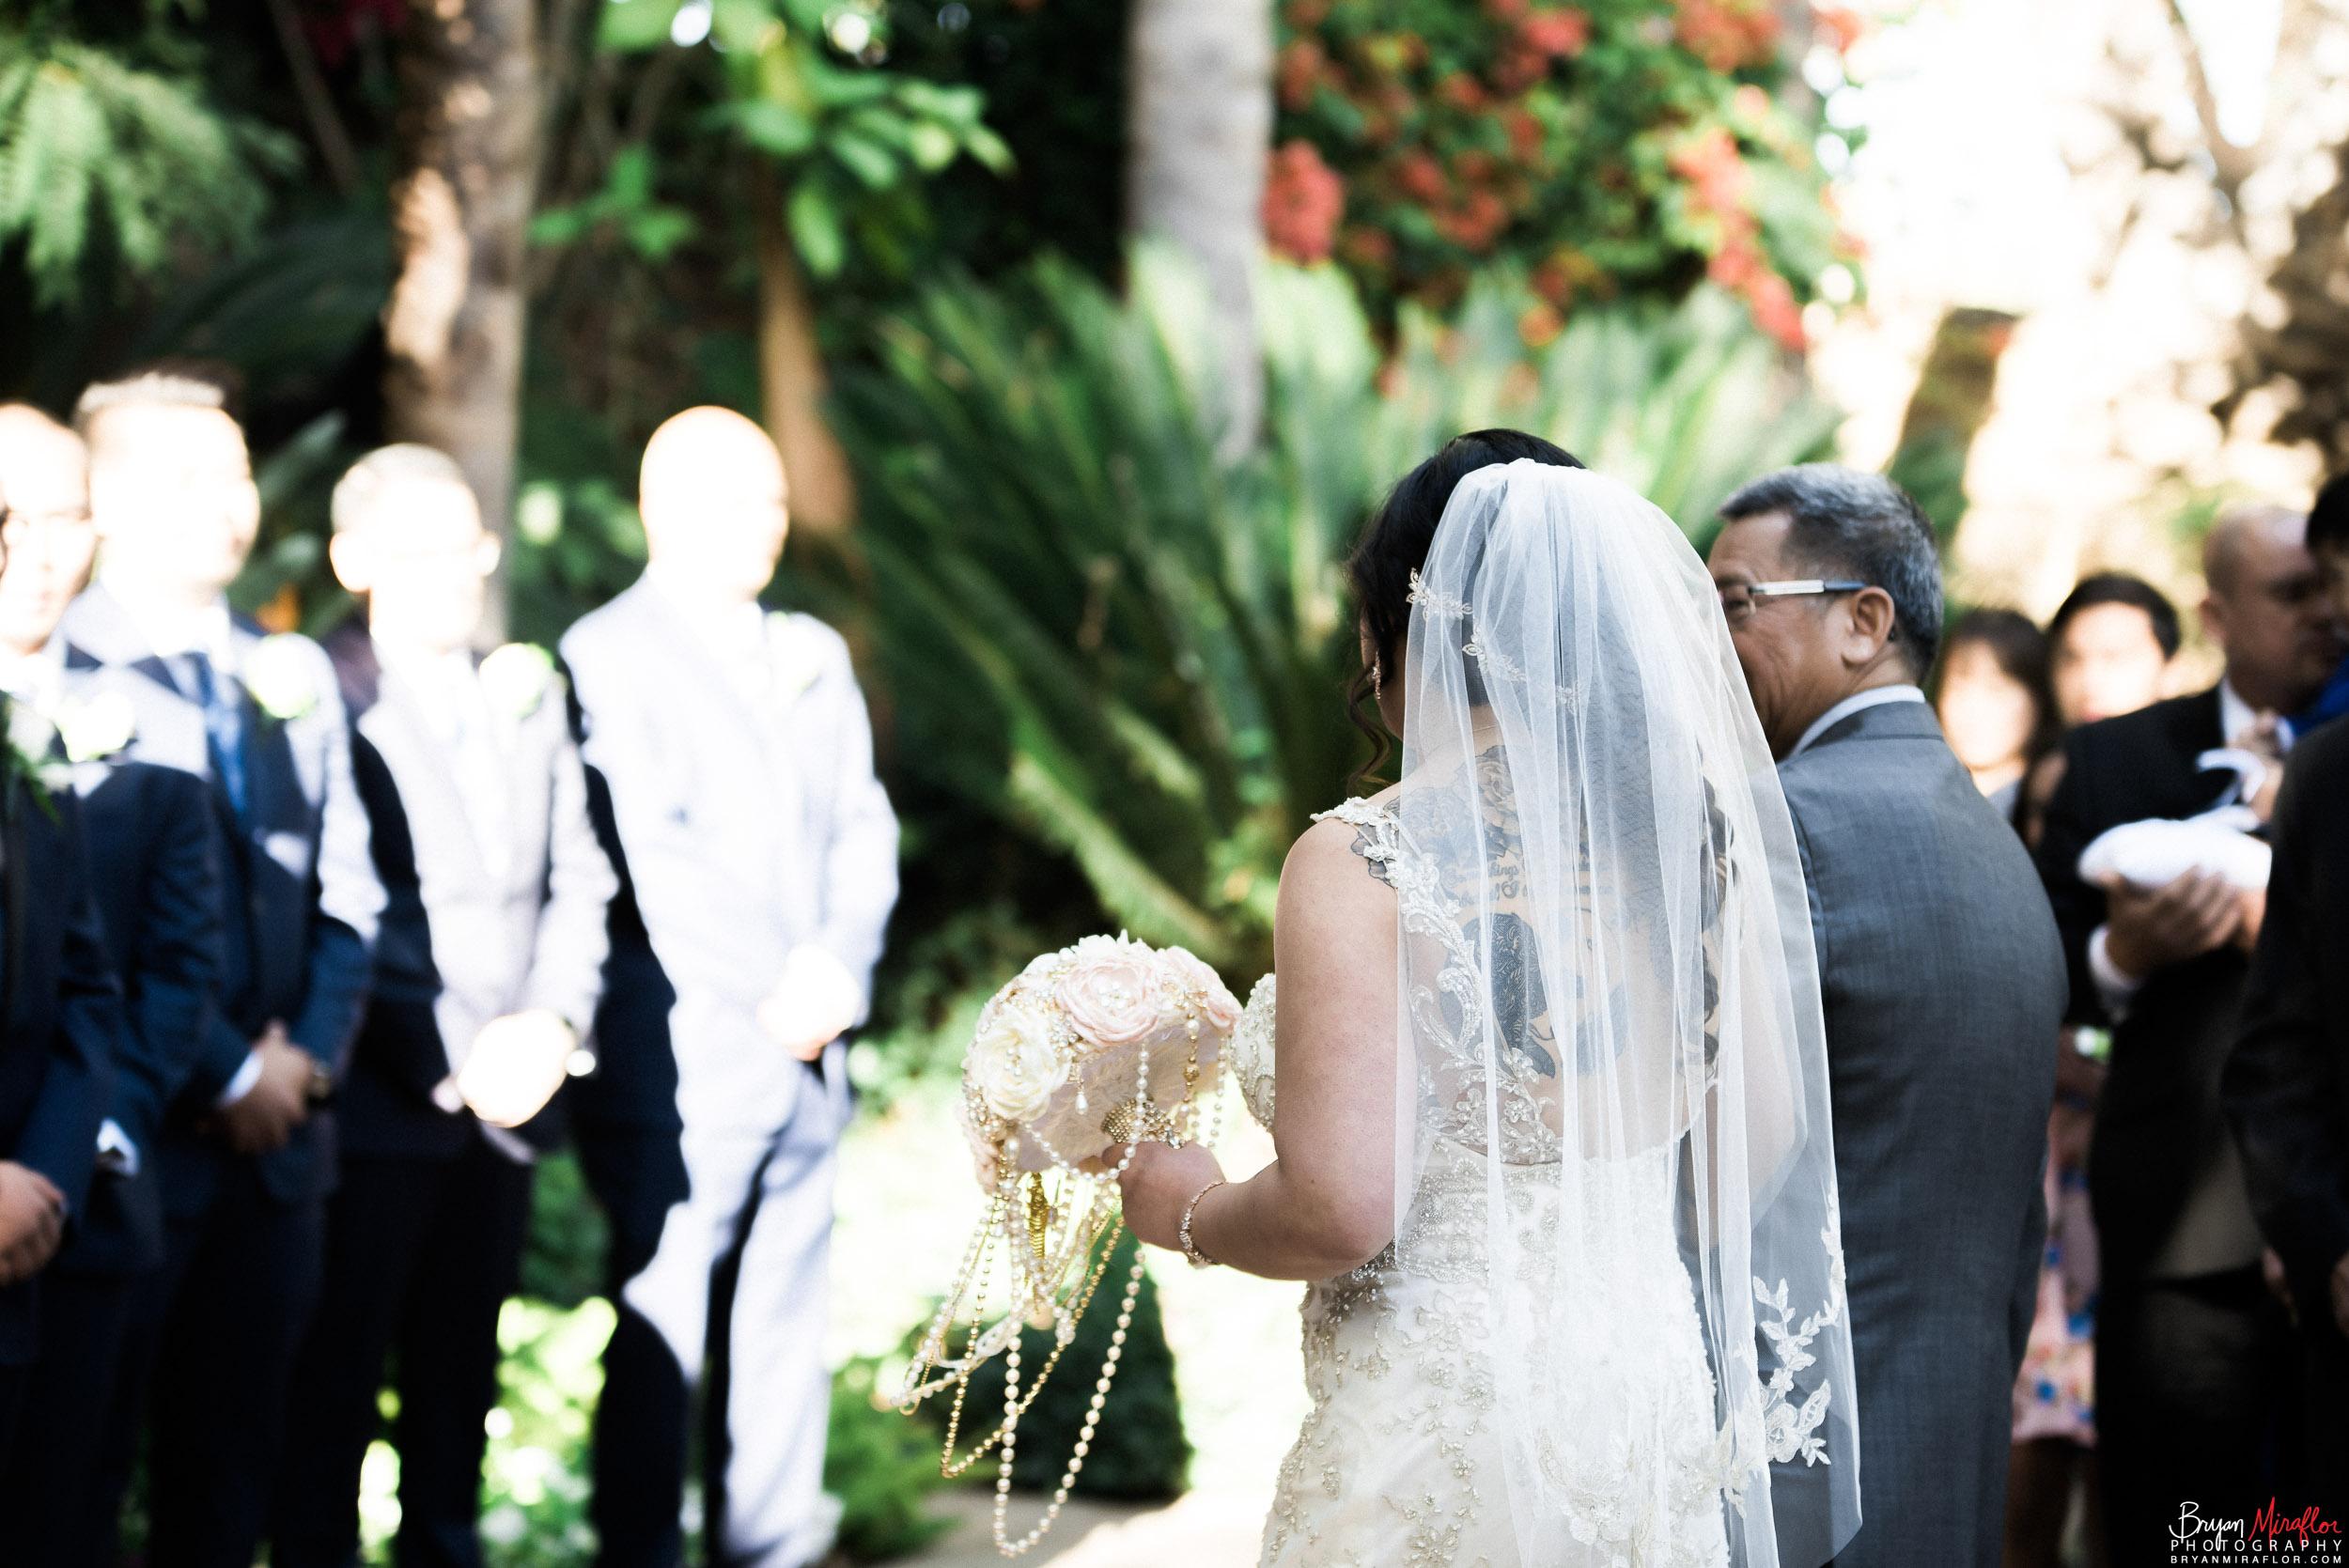 Bryan-Miraflor-Photography-Hannah-Jonathan-Married-Grand-Traditions-Estate-Gardens-Fallbrook-20171222-091.jpg